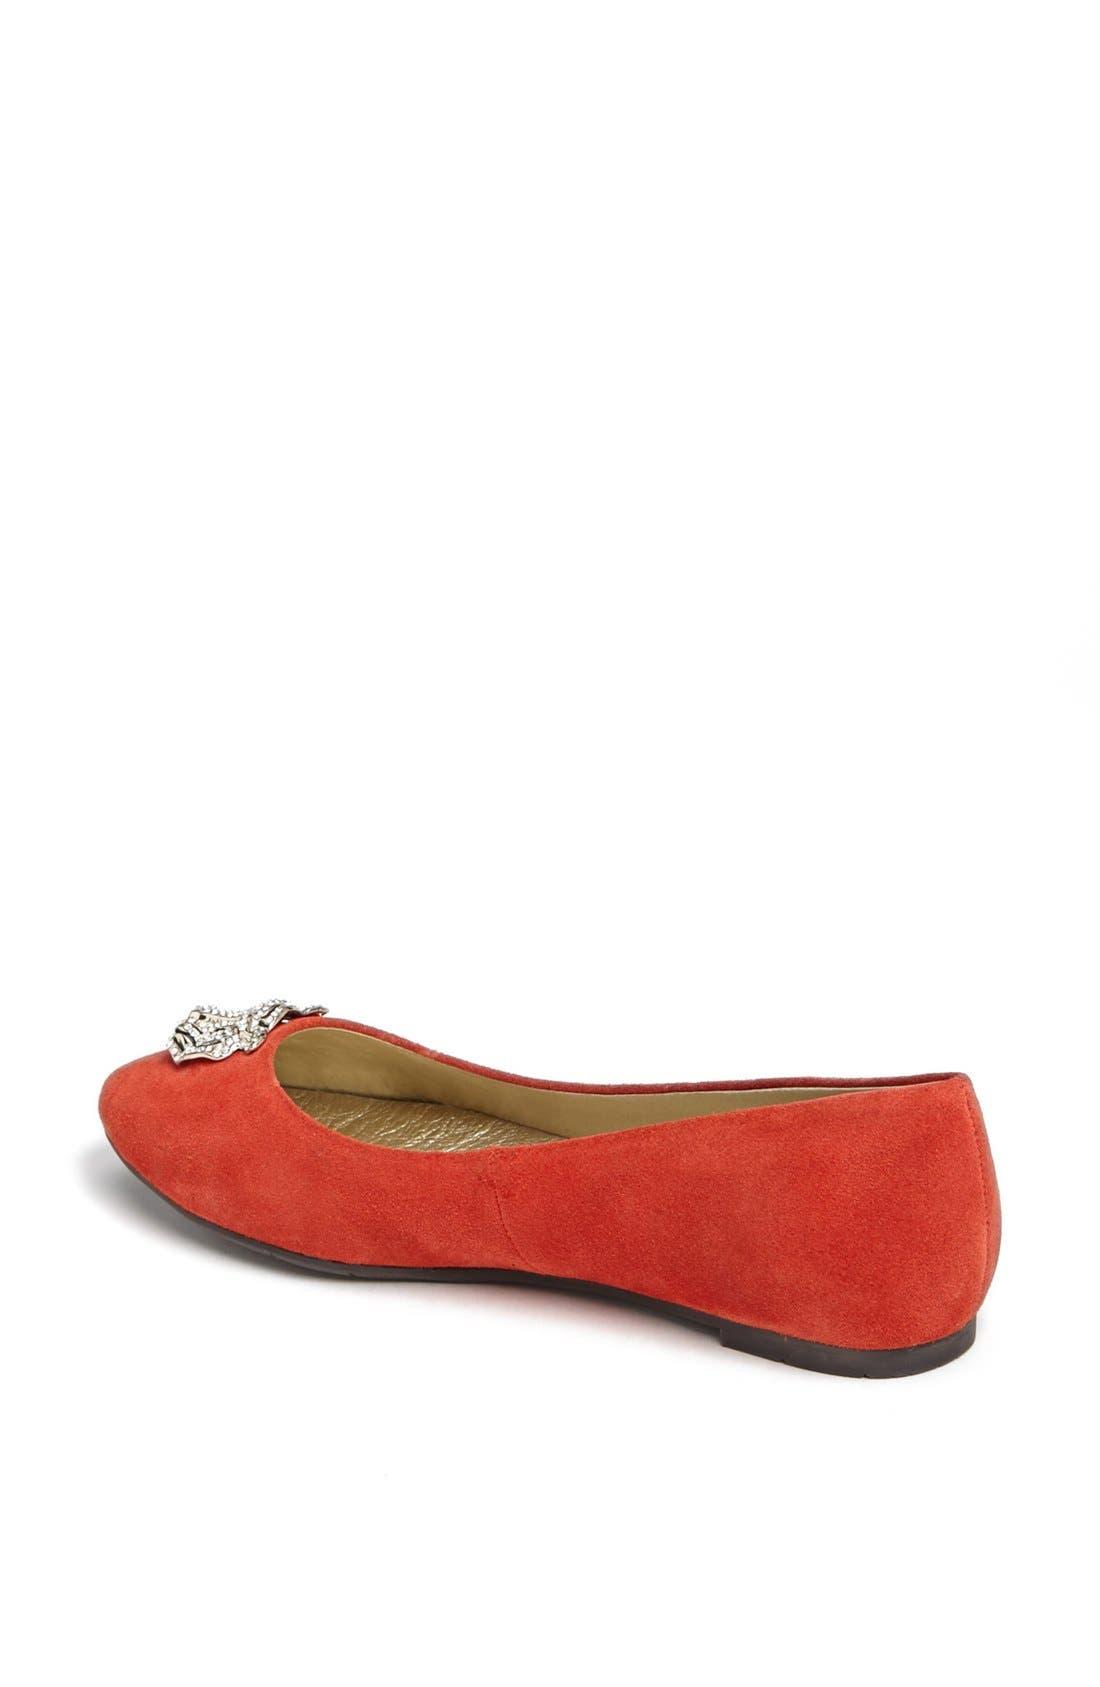 Alternate Image 2  - BC Footwear 'Tempo' Tiger Charm Flat